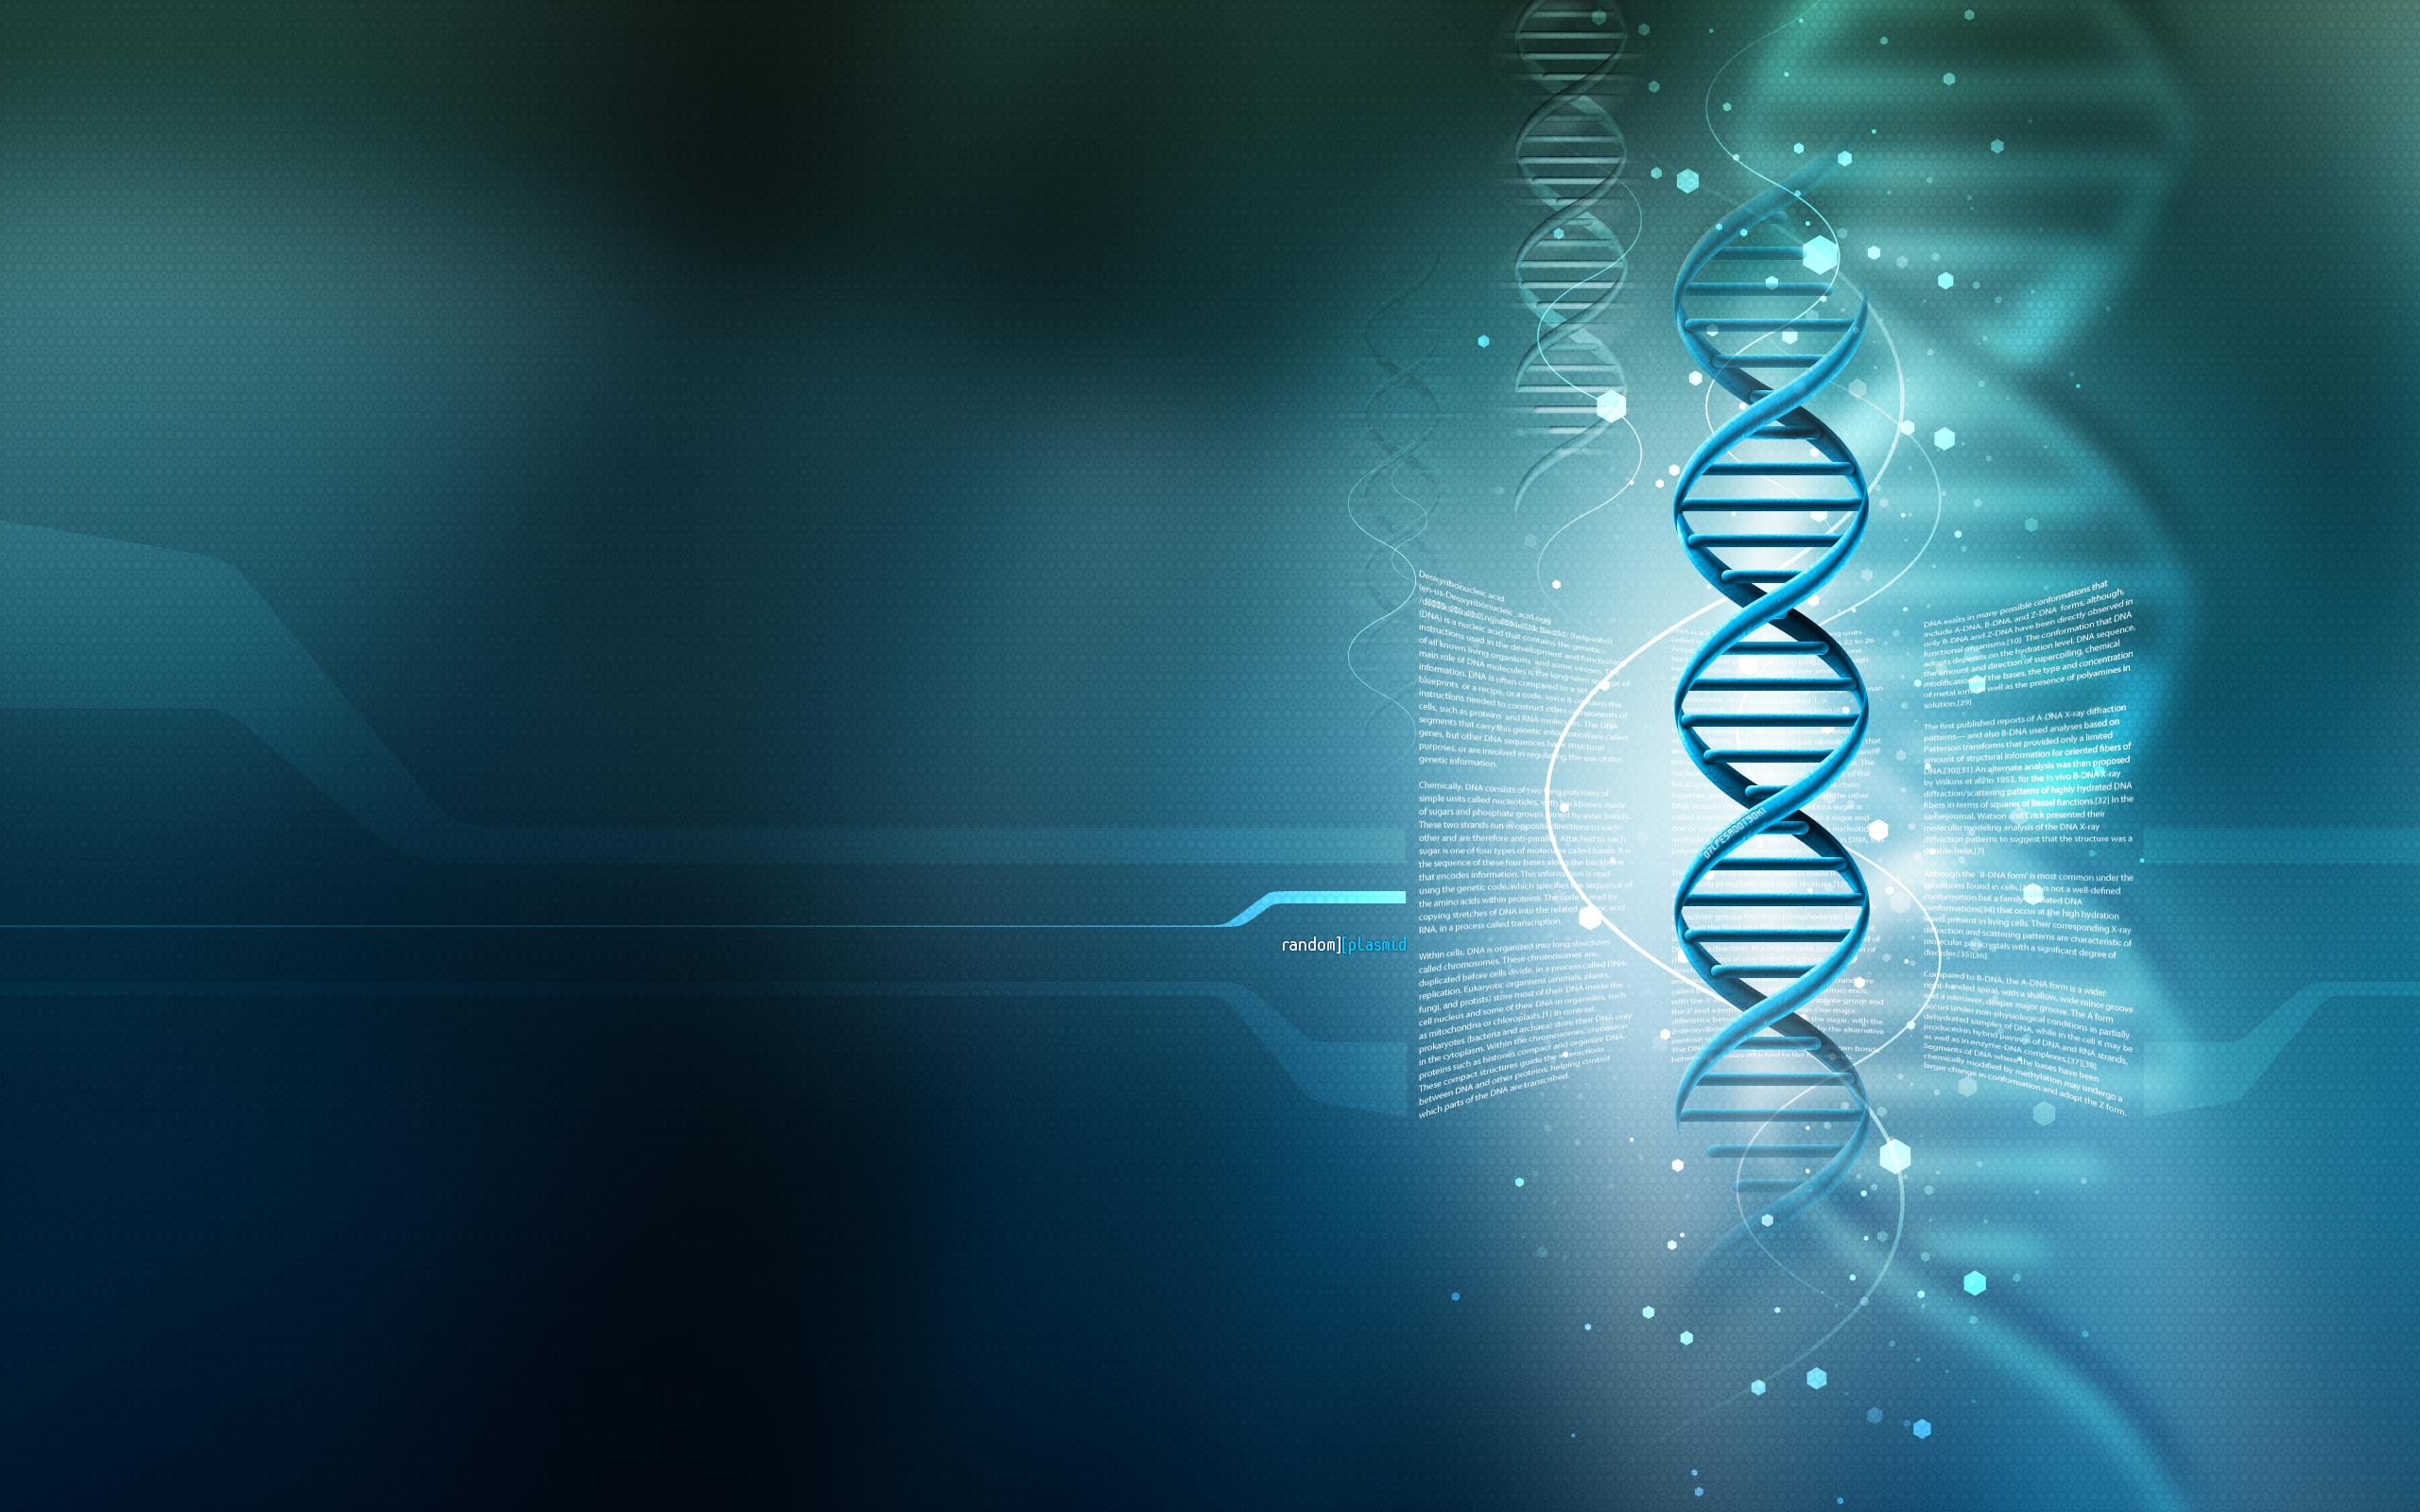 HD Wallpapers 3D DNA